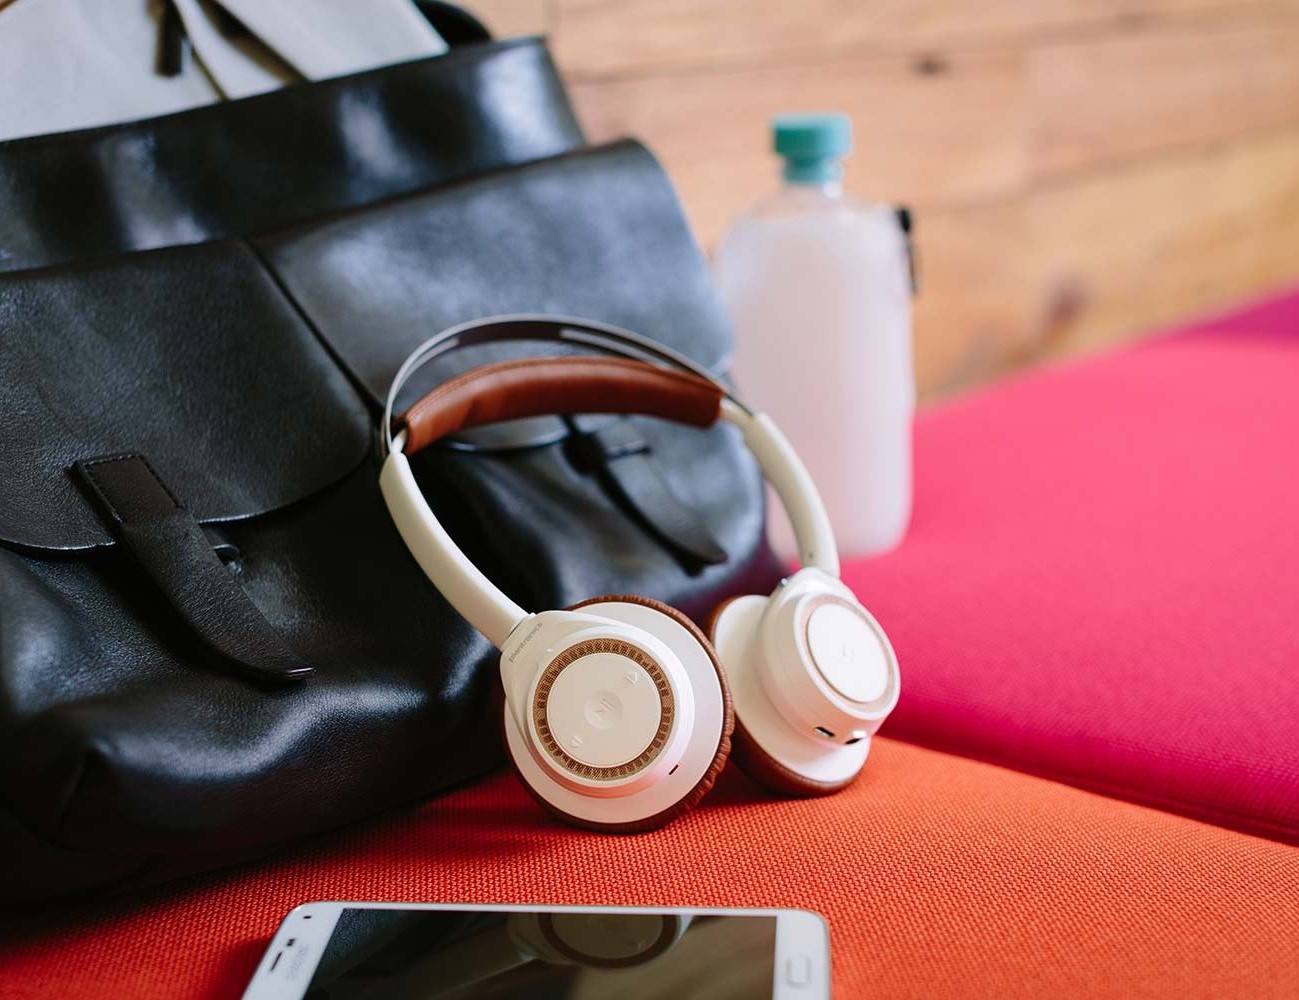 Backbeat SENSE SE Special Edition Headphones by Plantronics